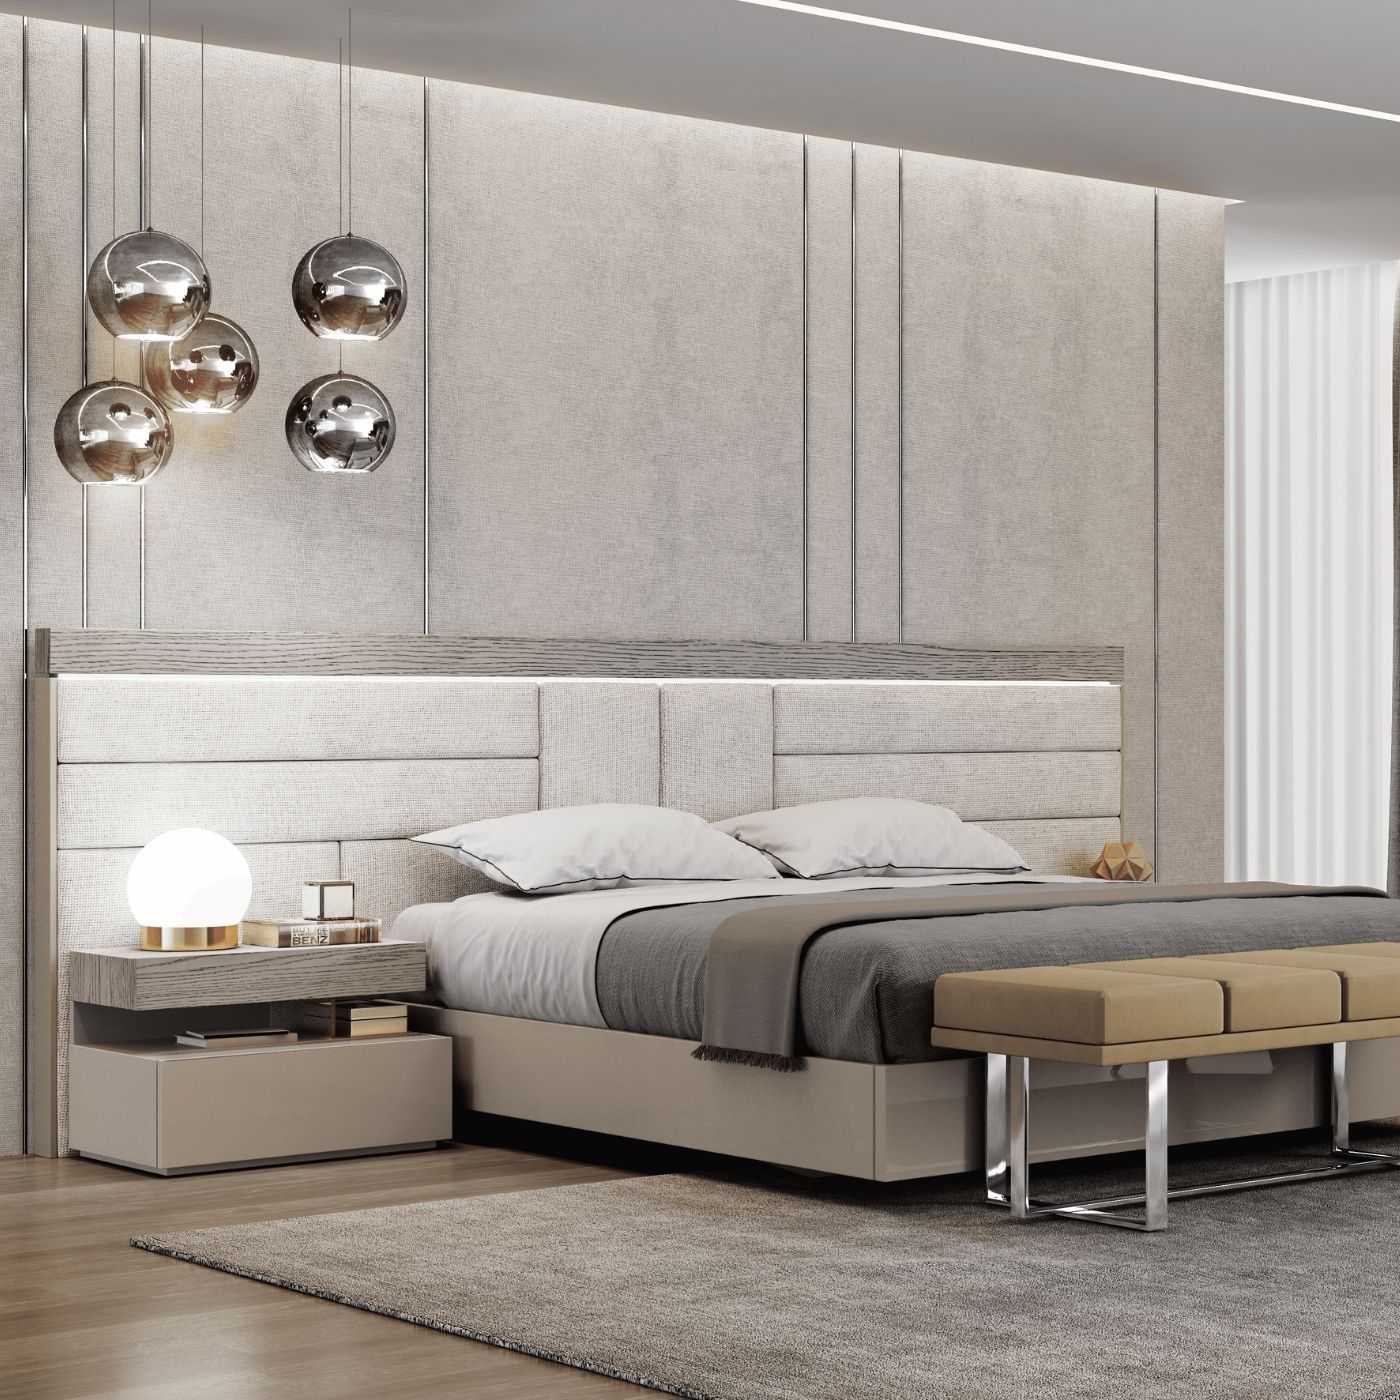 Opala Bed